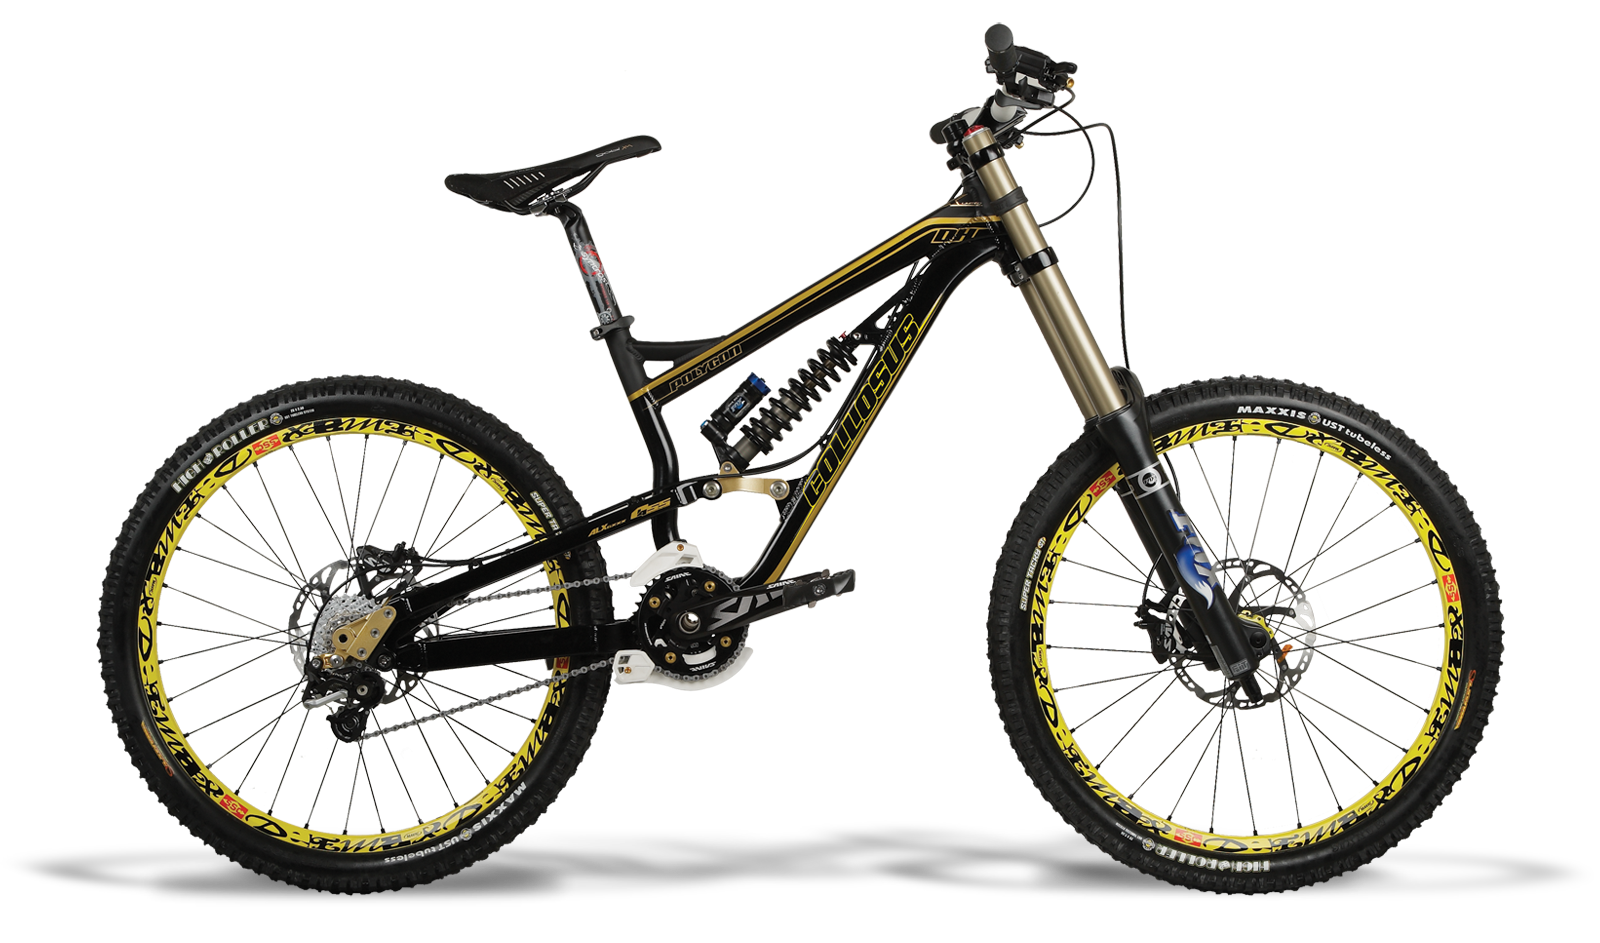 Alat transportasi masa kini: Sepeda gunung